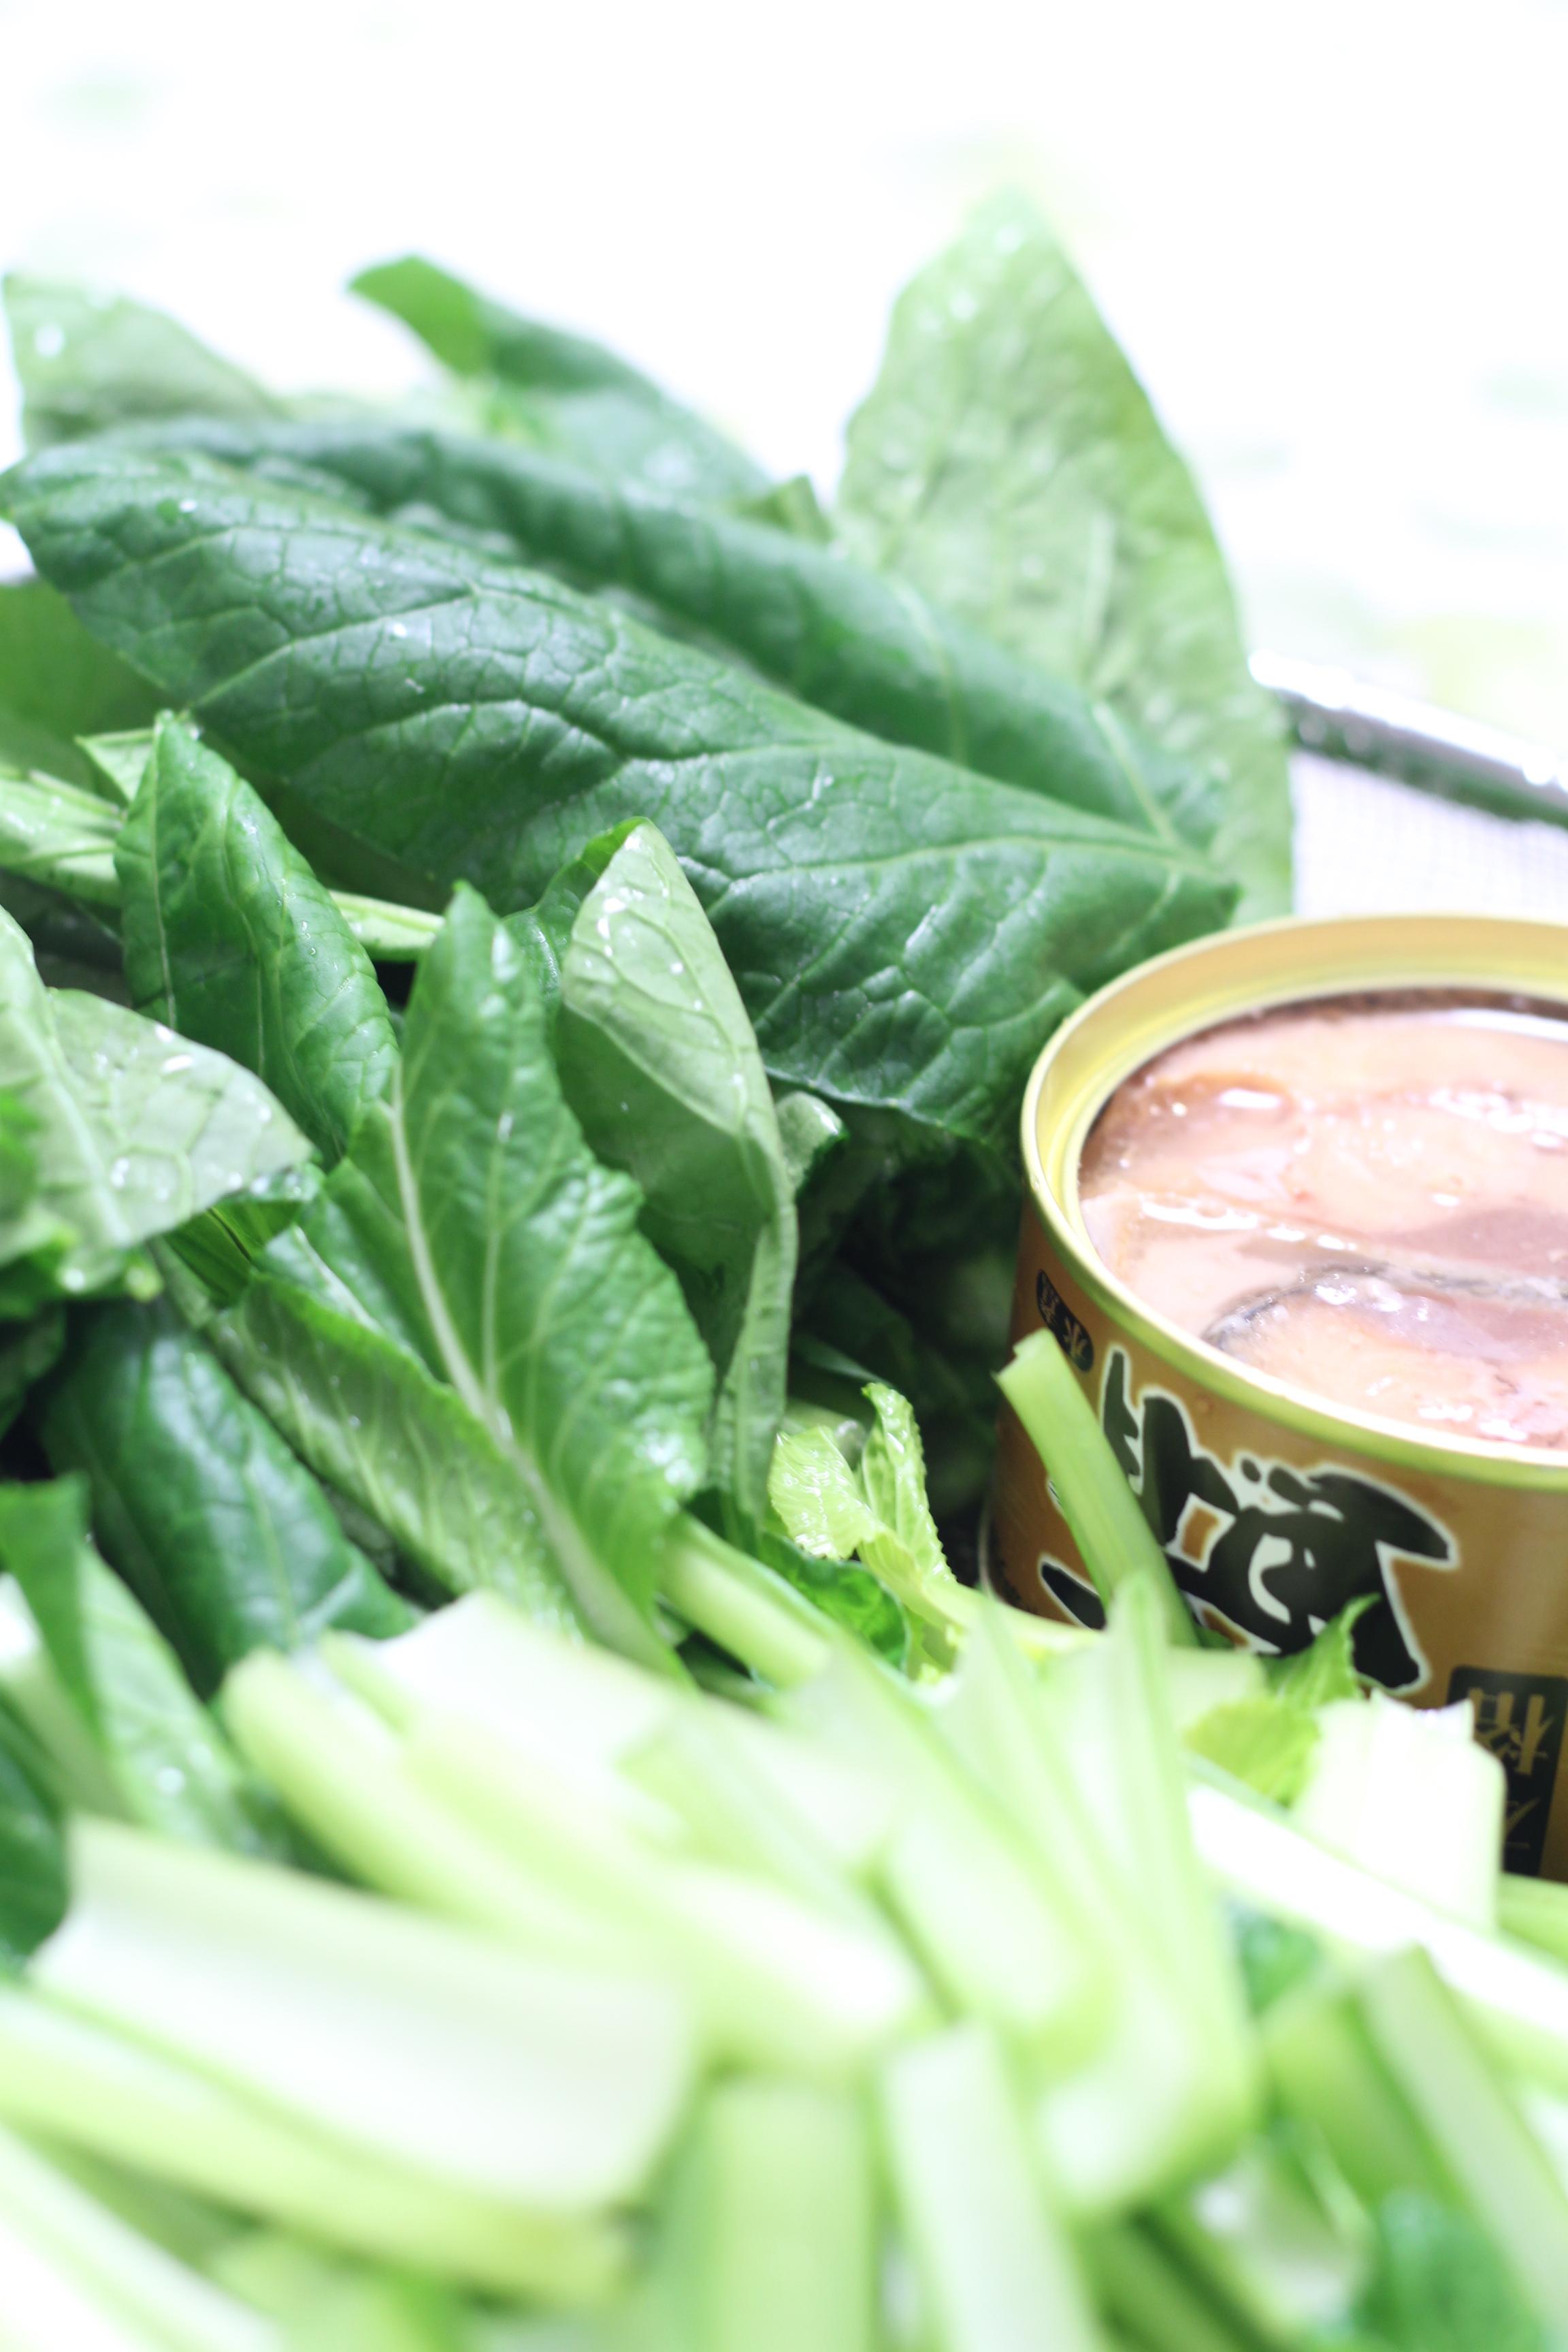 a-ta-sante糖質制限パン料理教室、阿倍野区西田辺。一人暮らしの応援レシピ『鯖缶と小松菜の5分間クッキング』